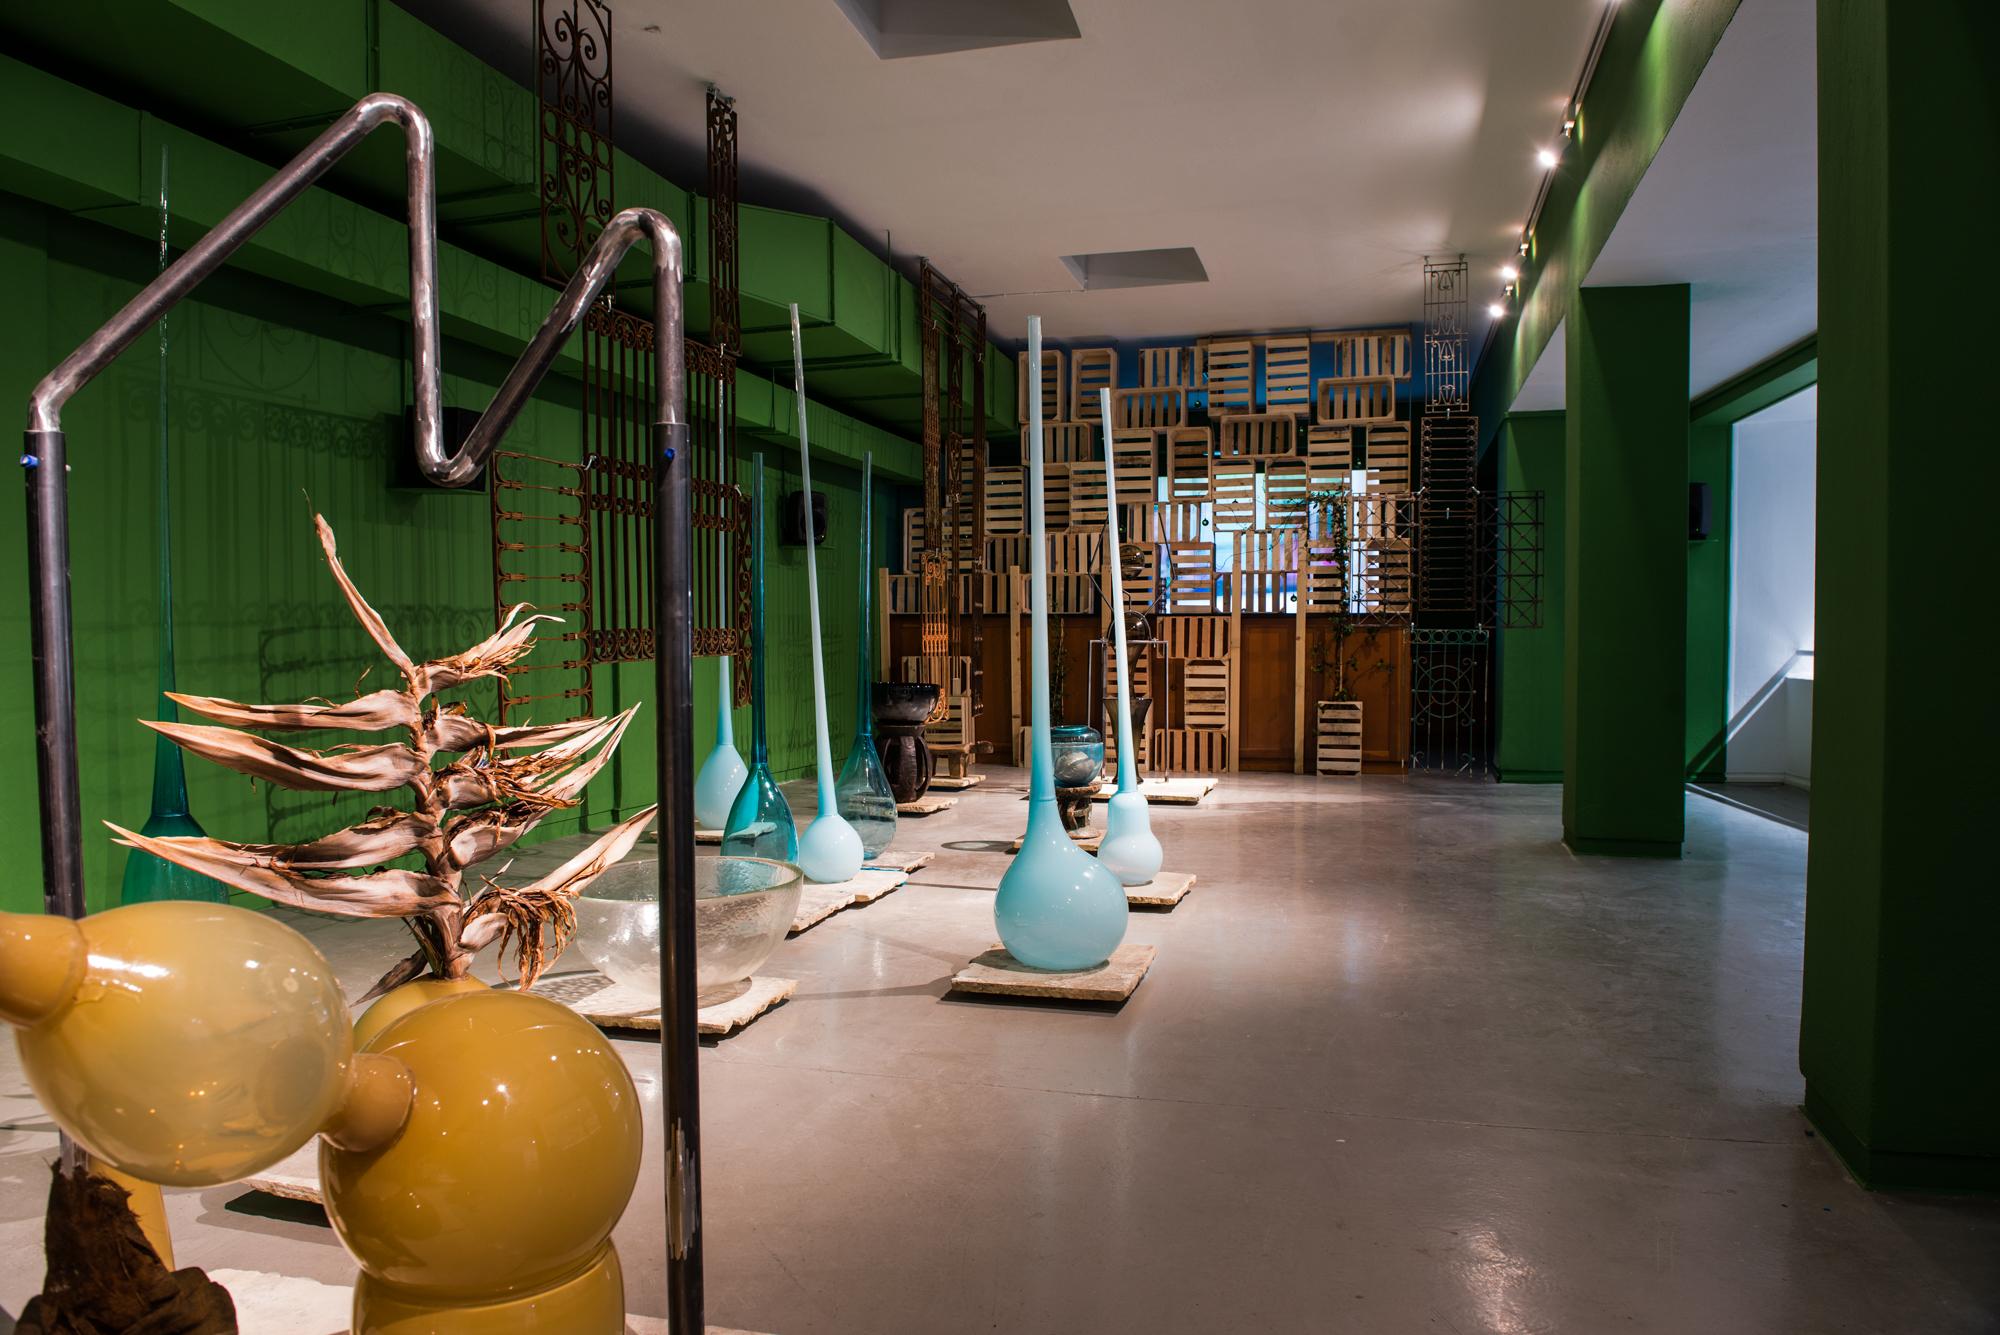 Galerie Barbara Thumm \ María Magdalena Campos-Pons – Matanzas Sound Map